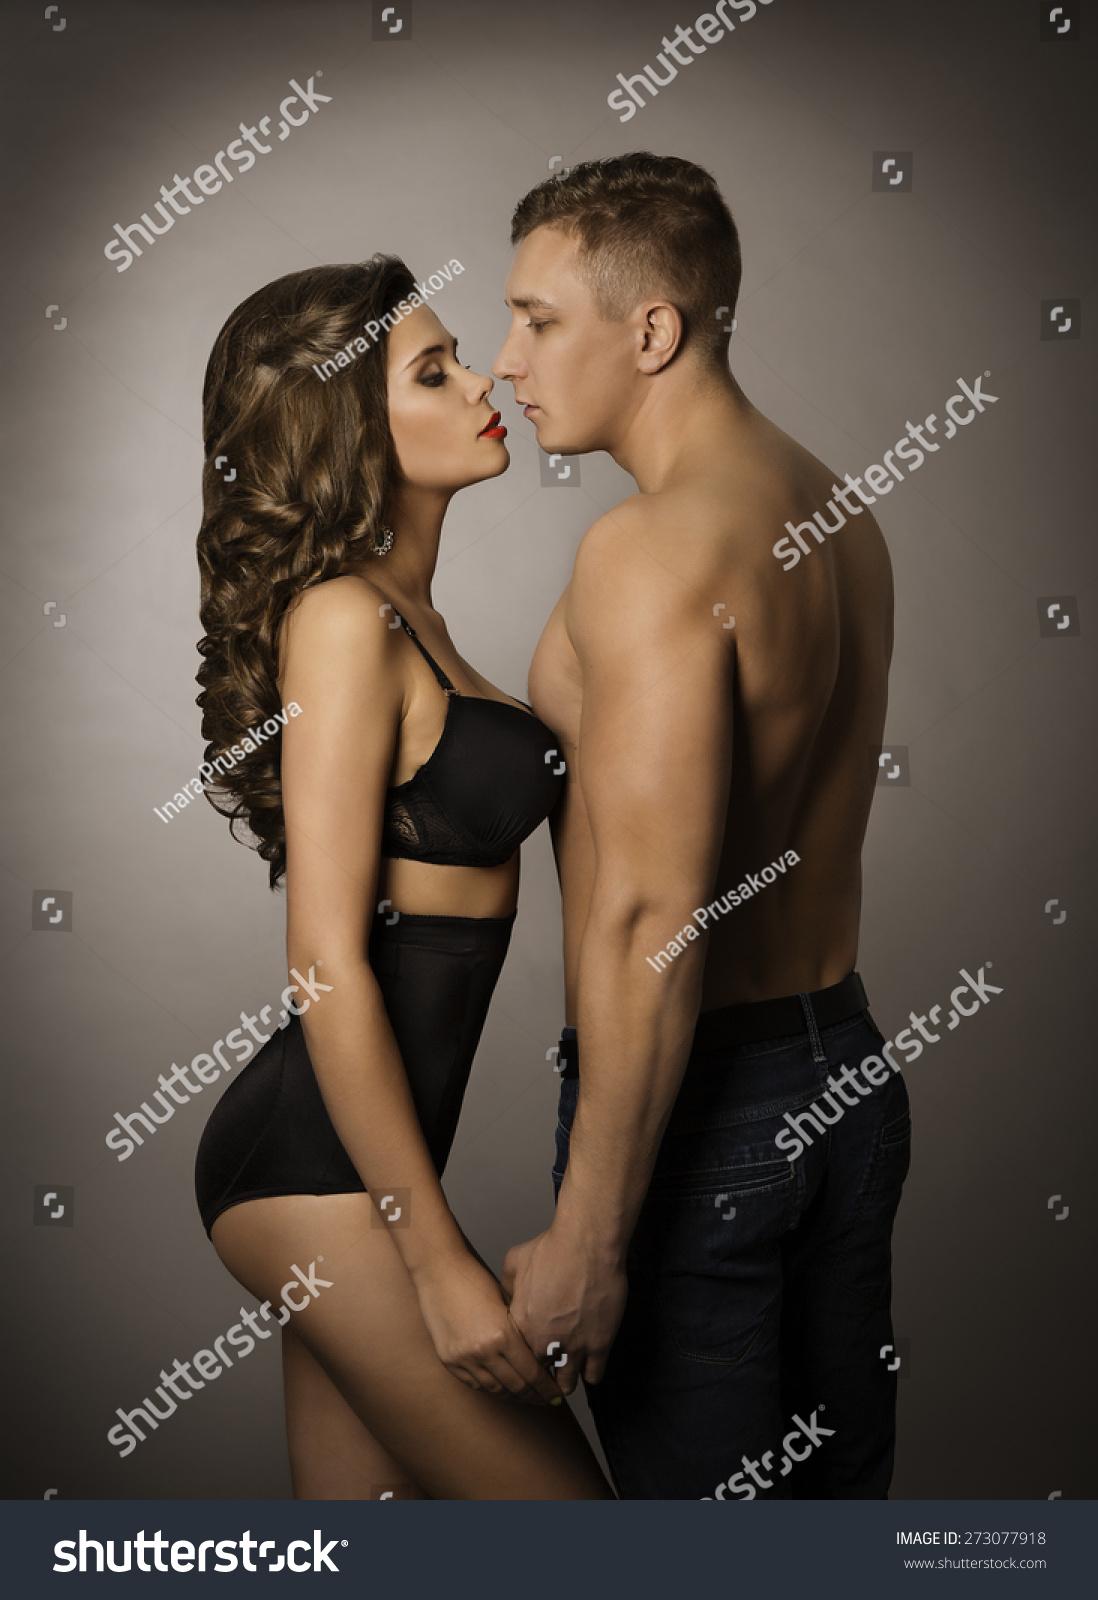 Women kissing hot A Very